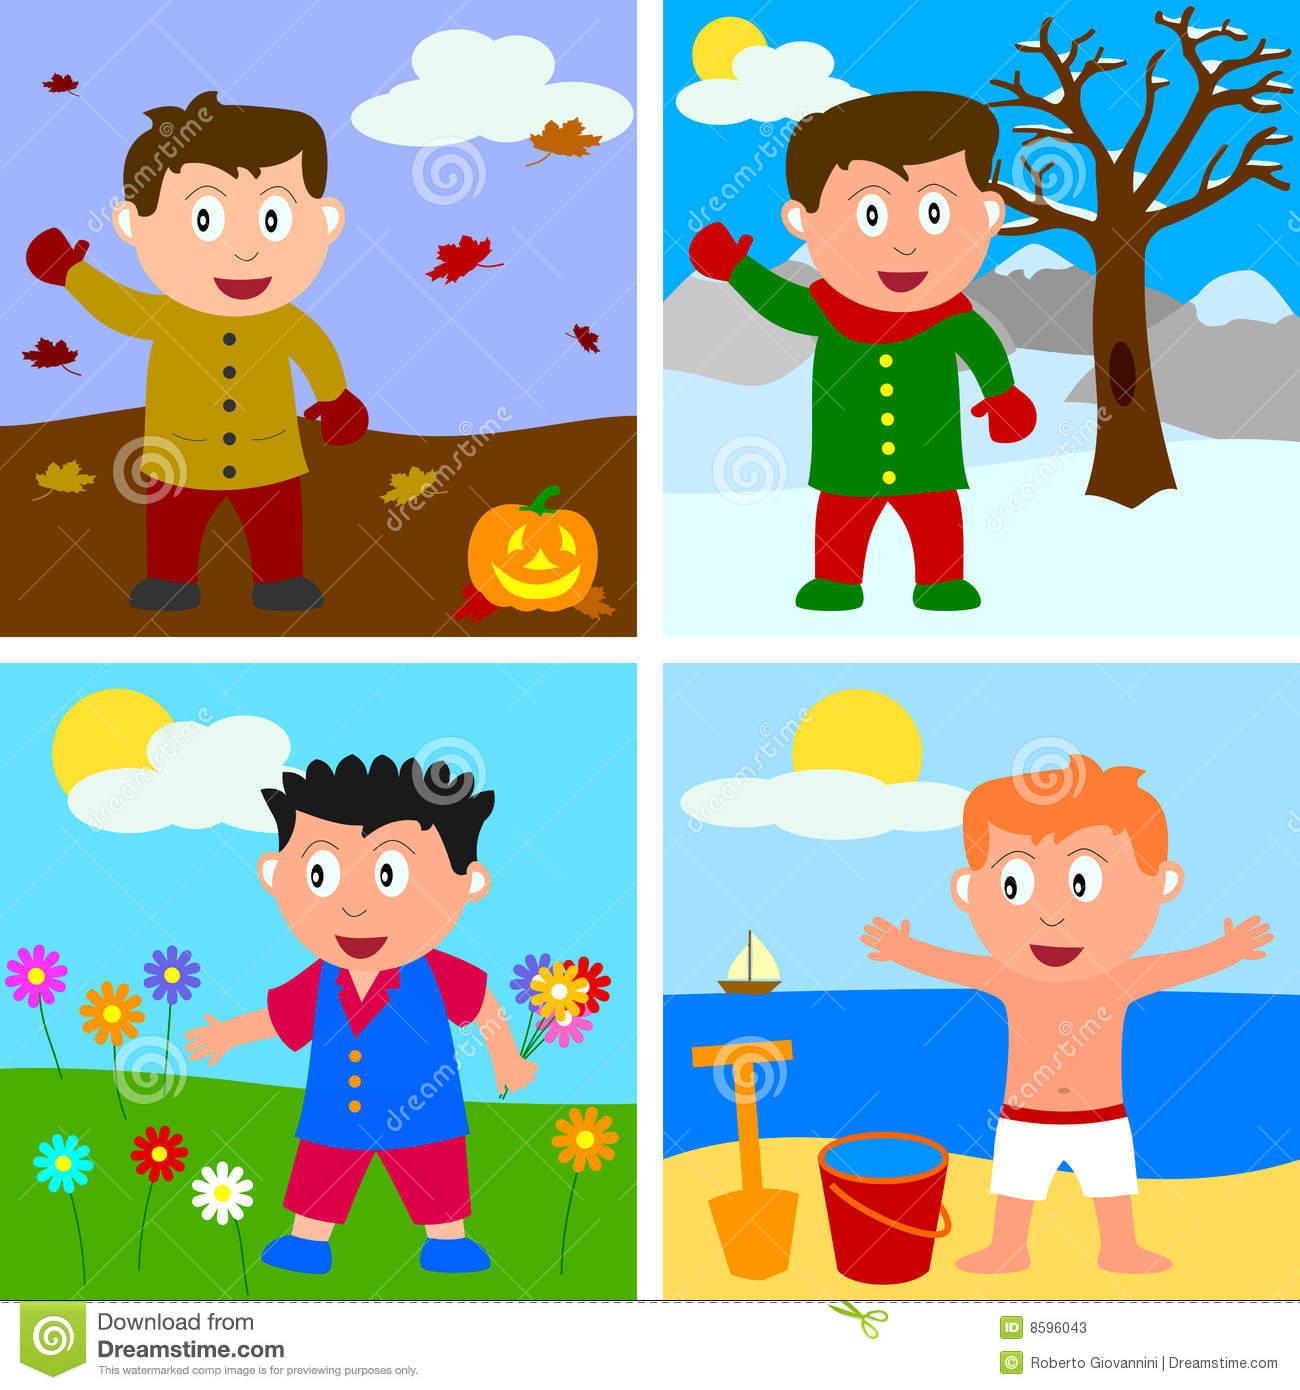 4 Seasons Clothes Clipart.